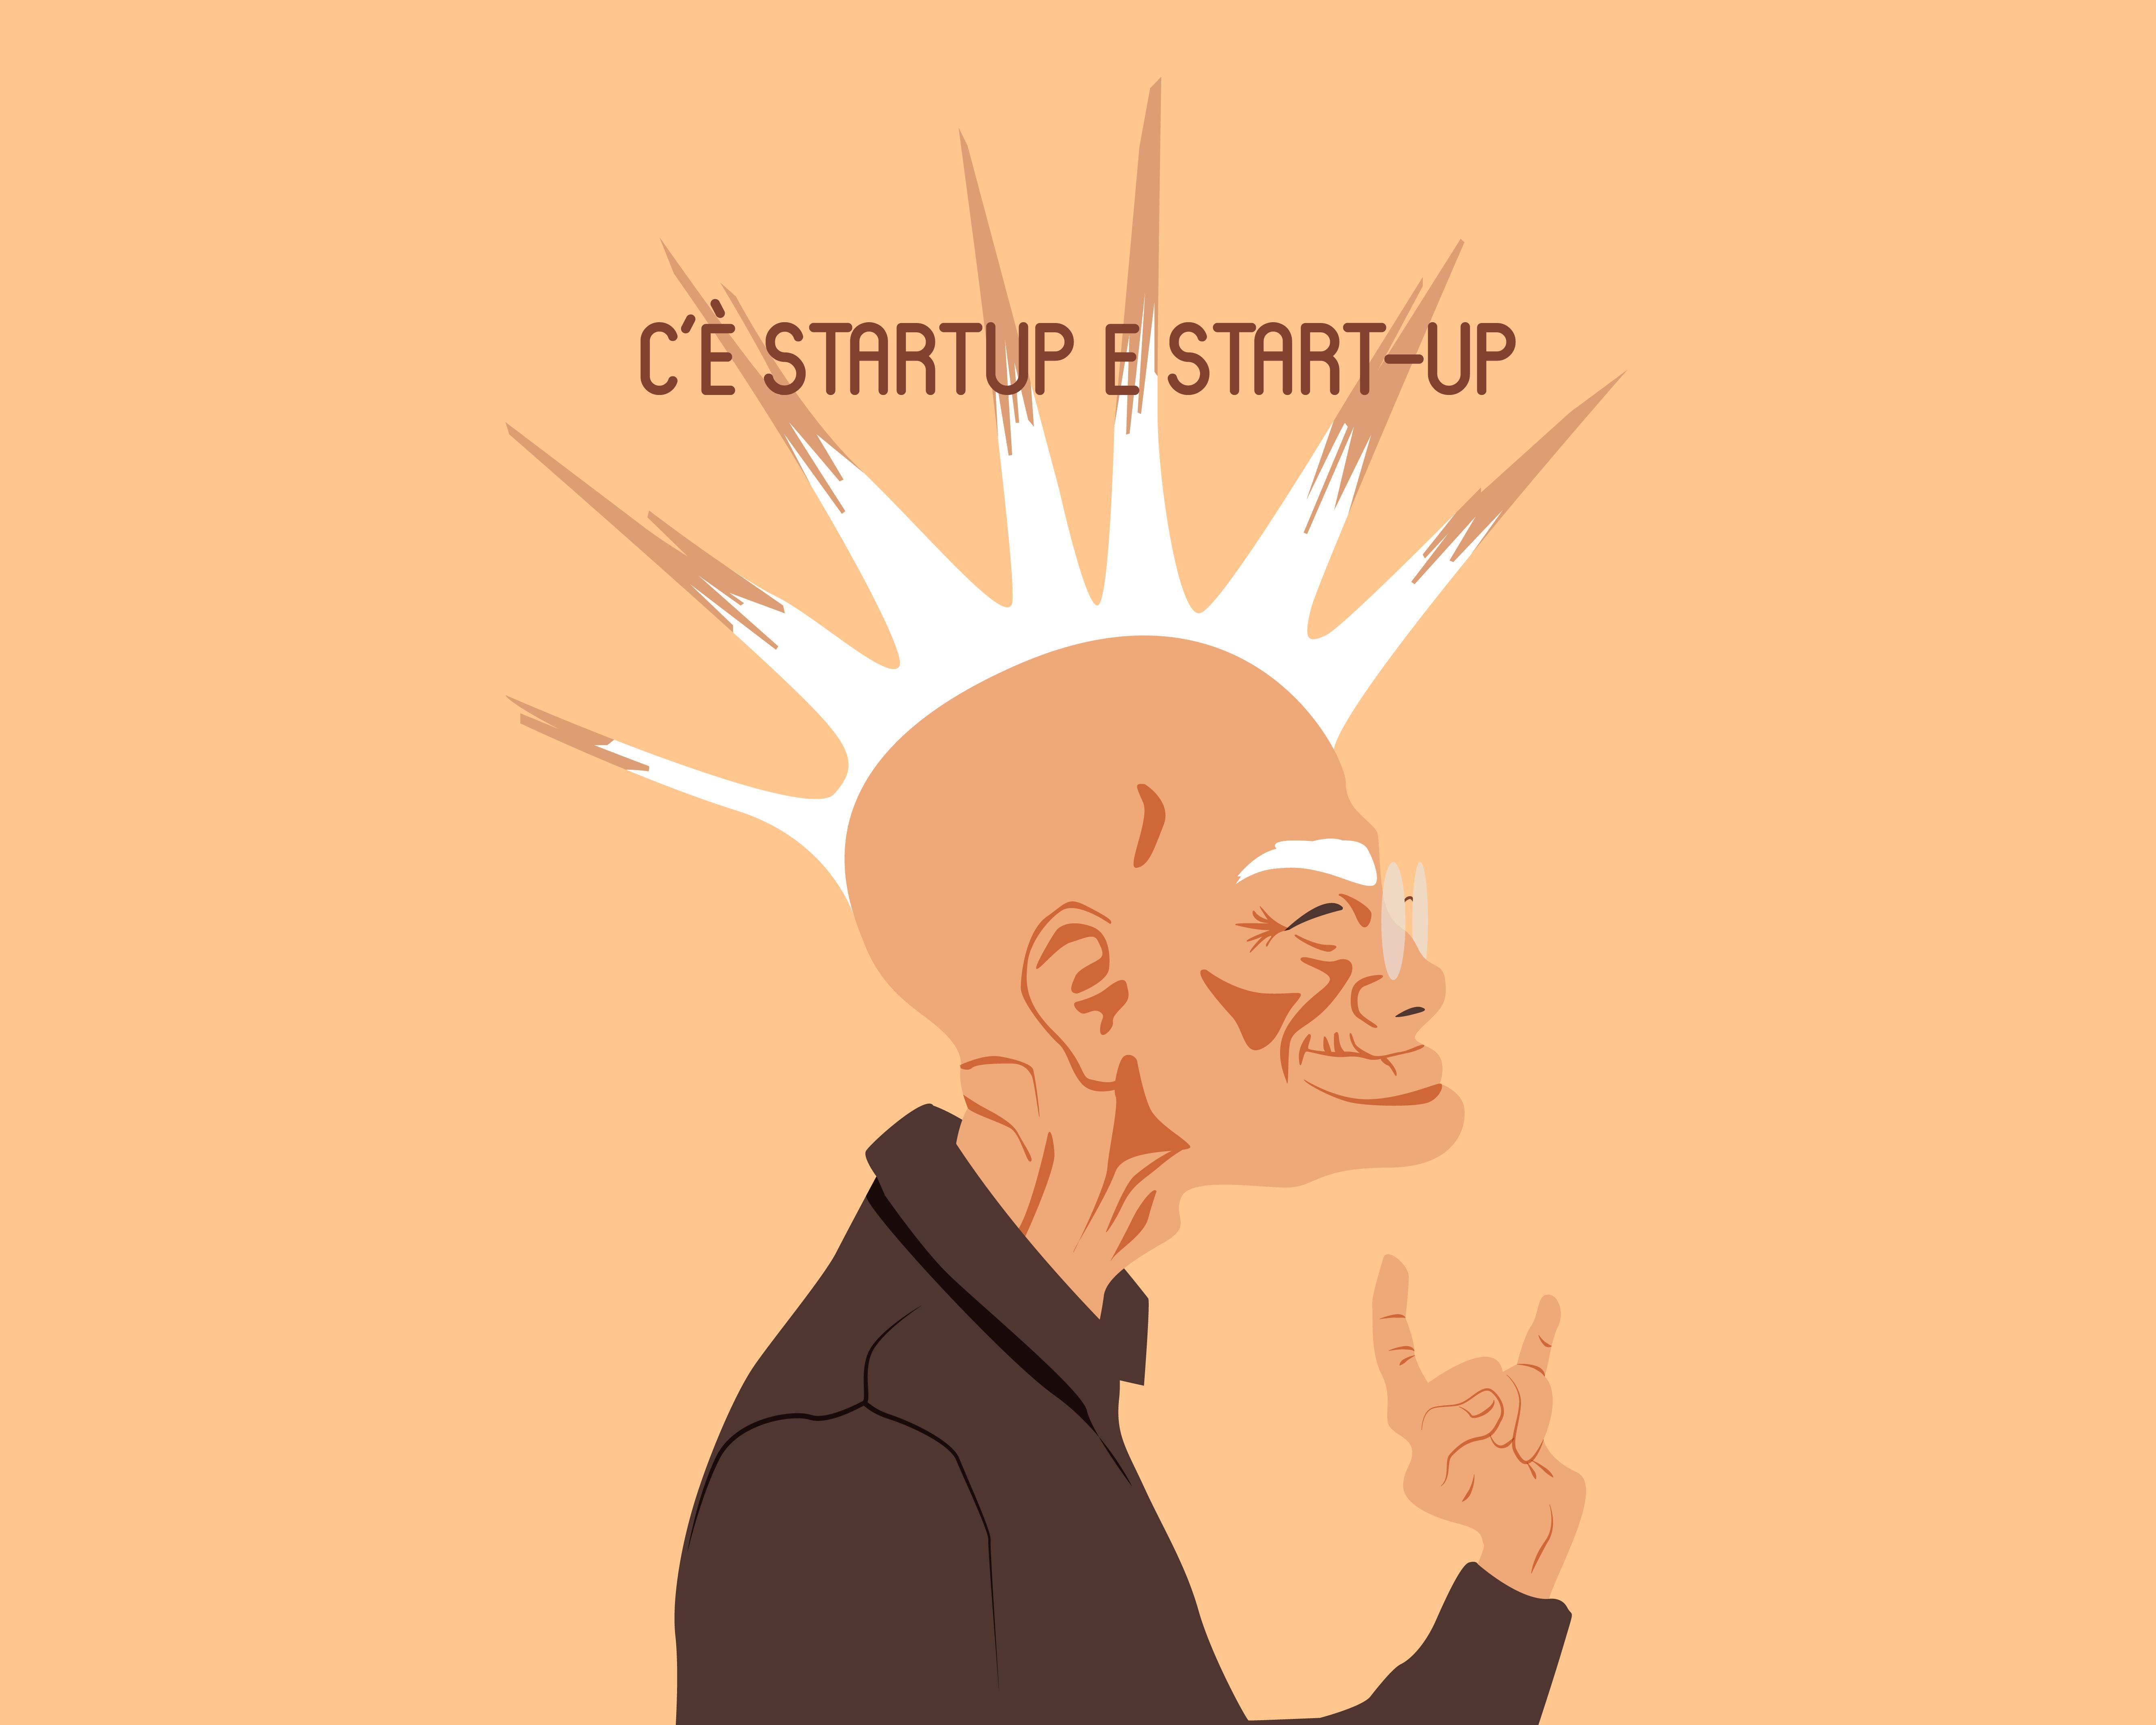 C'è startup e start-up